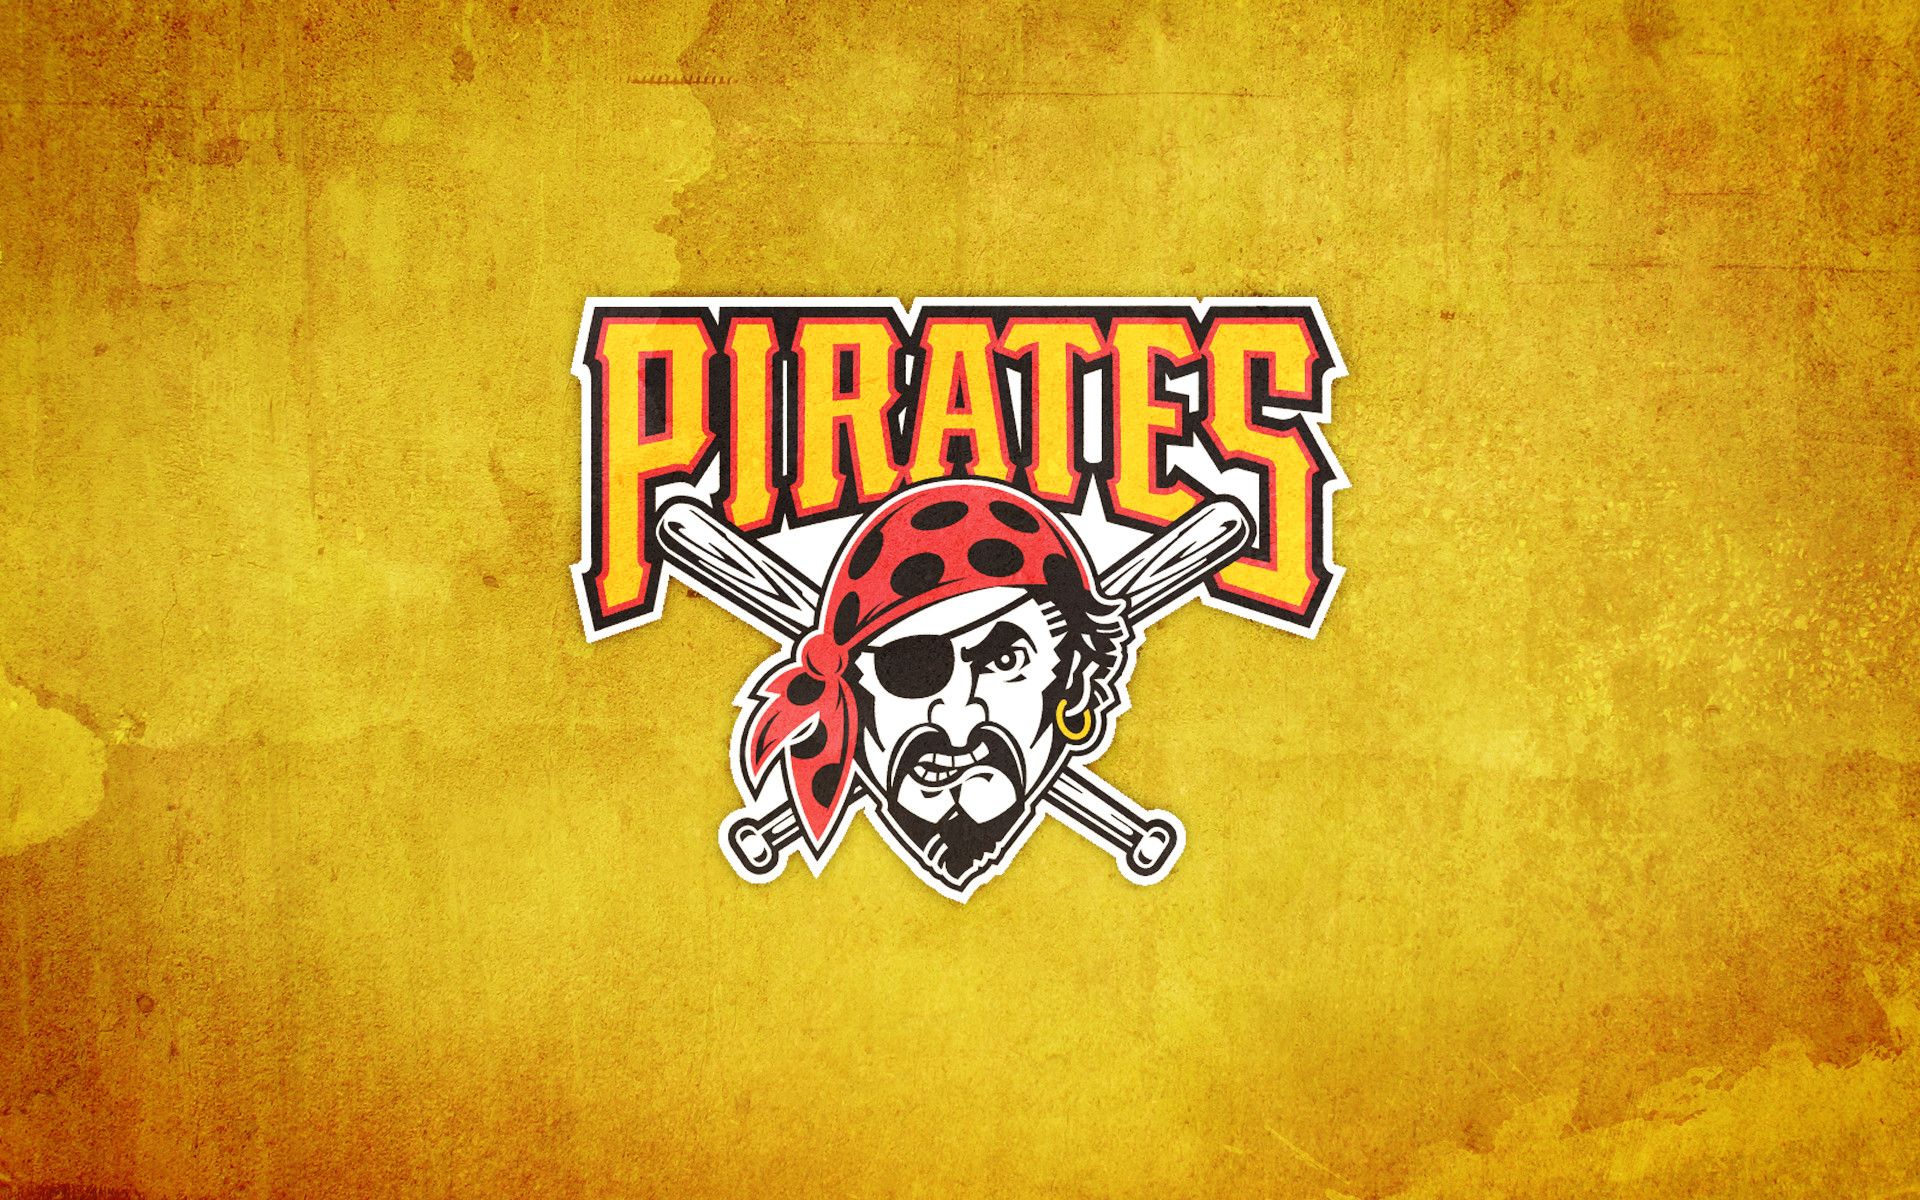 Pirates Baseball Wallpaper Free Downlaod Wallpaper with .